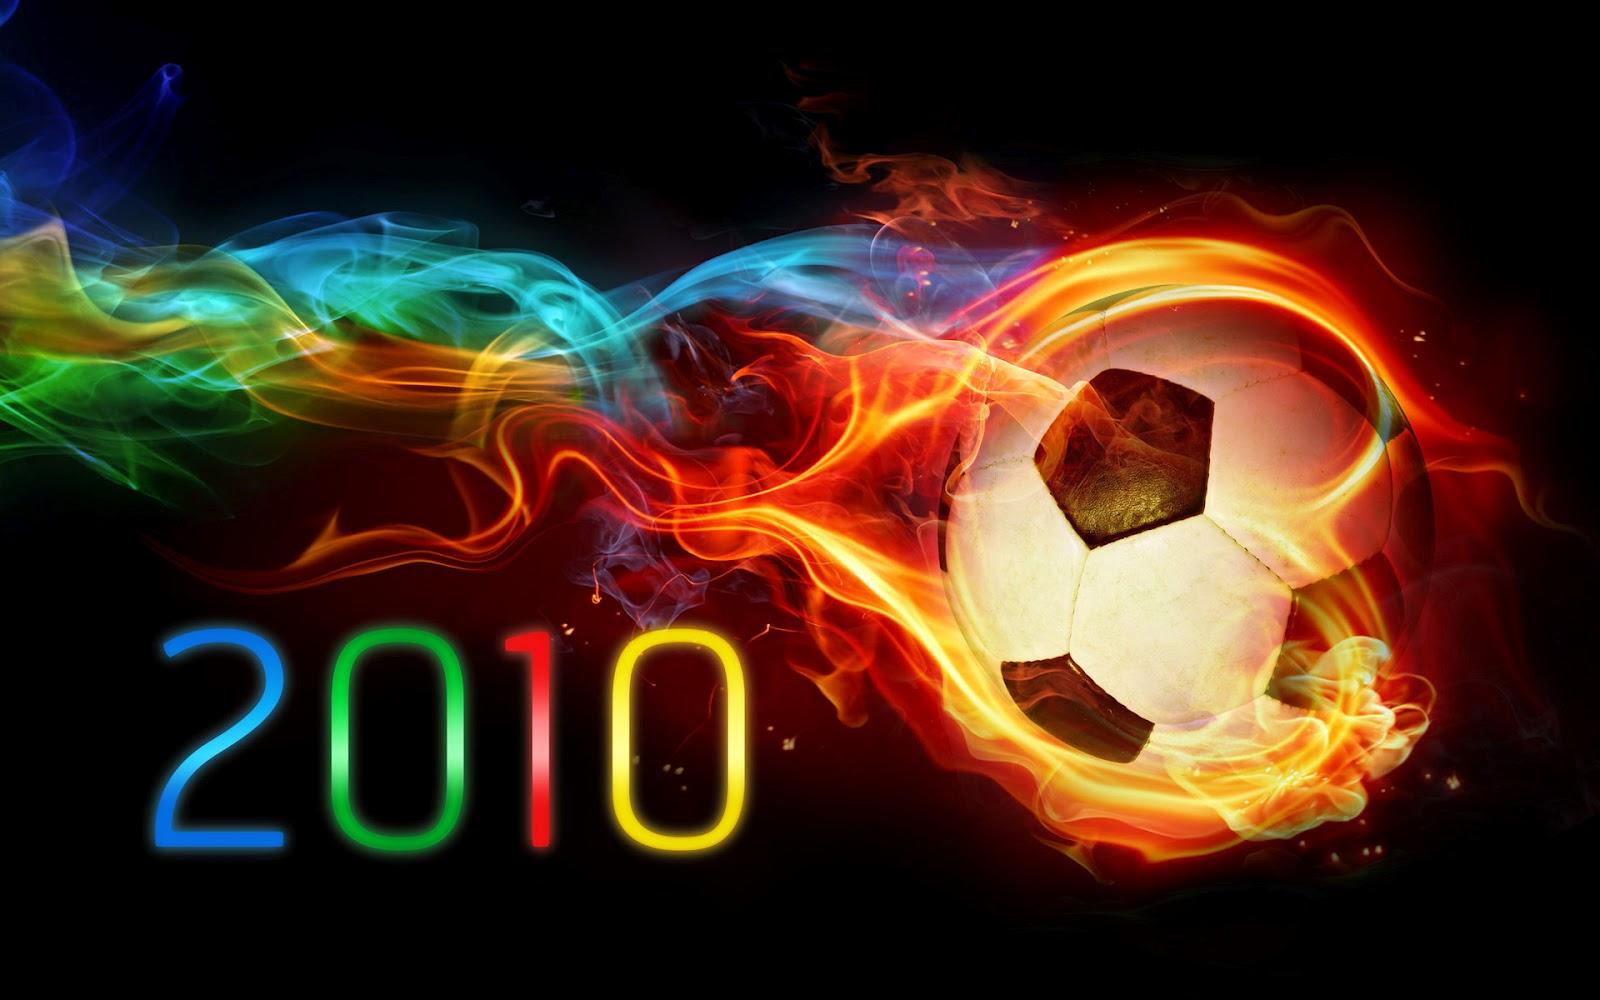 http://3.bp.blogspot.com/-jEFXVe1Zf8Q/T3_iZLn_uBI/AAAAAAAAERQ/s1Z7-wJurzQ/s1600/+Football+Wallpapers+HD+(2).jpg